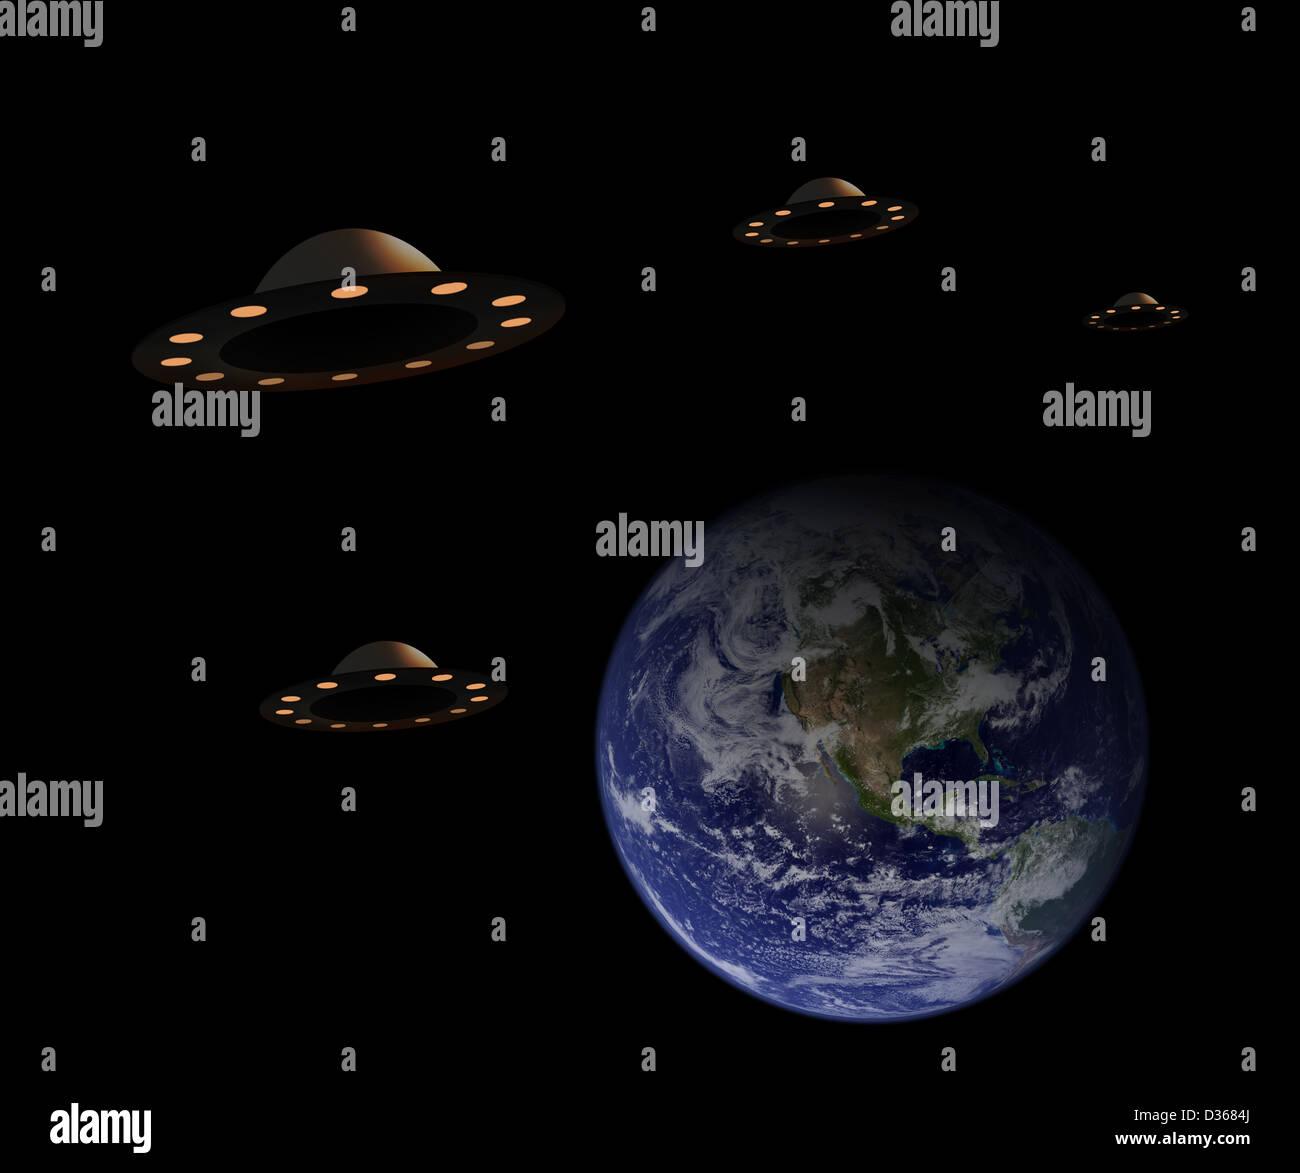 nasa aliens on earth - photo #17